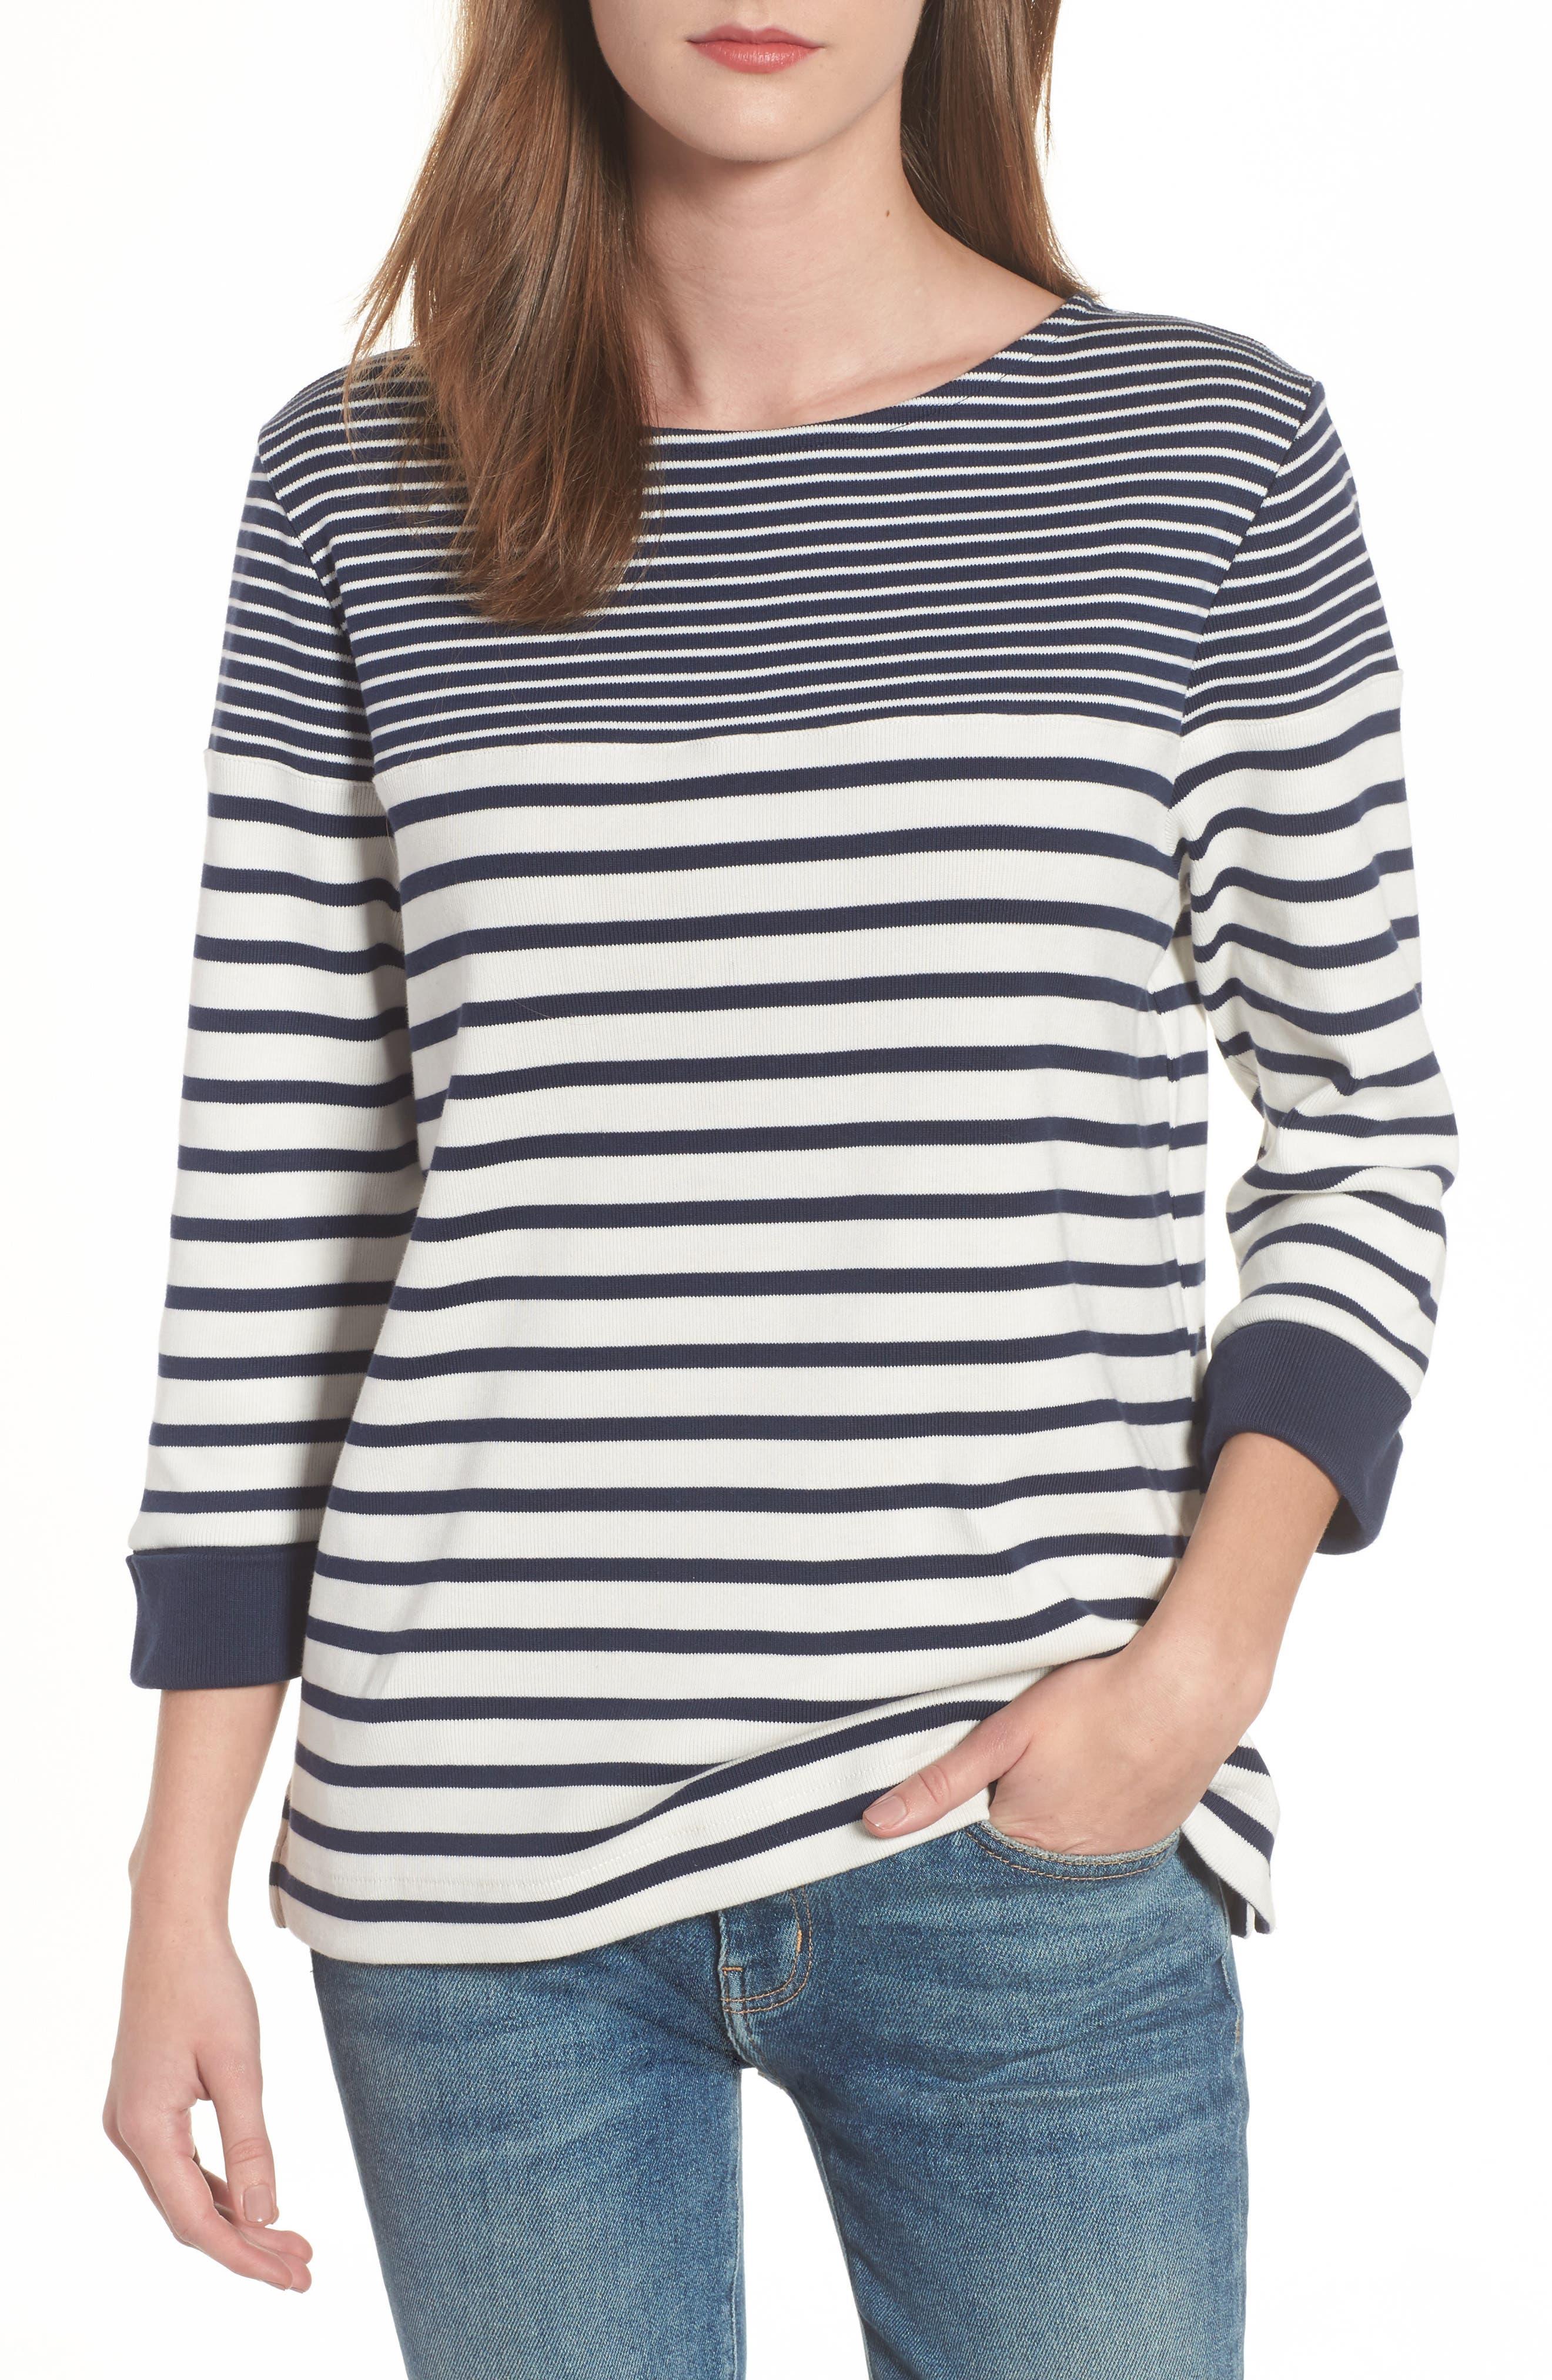 Fins Sweater,                         Main,                         color, 100